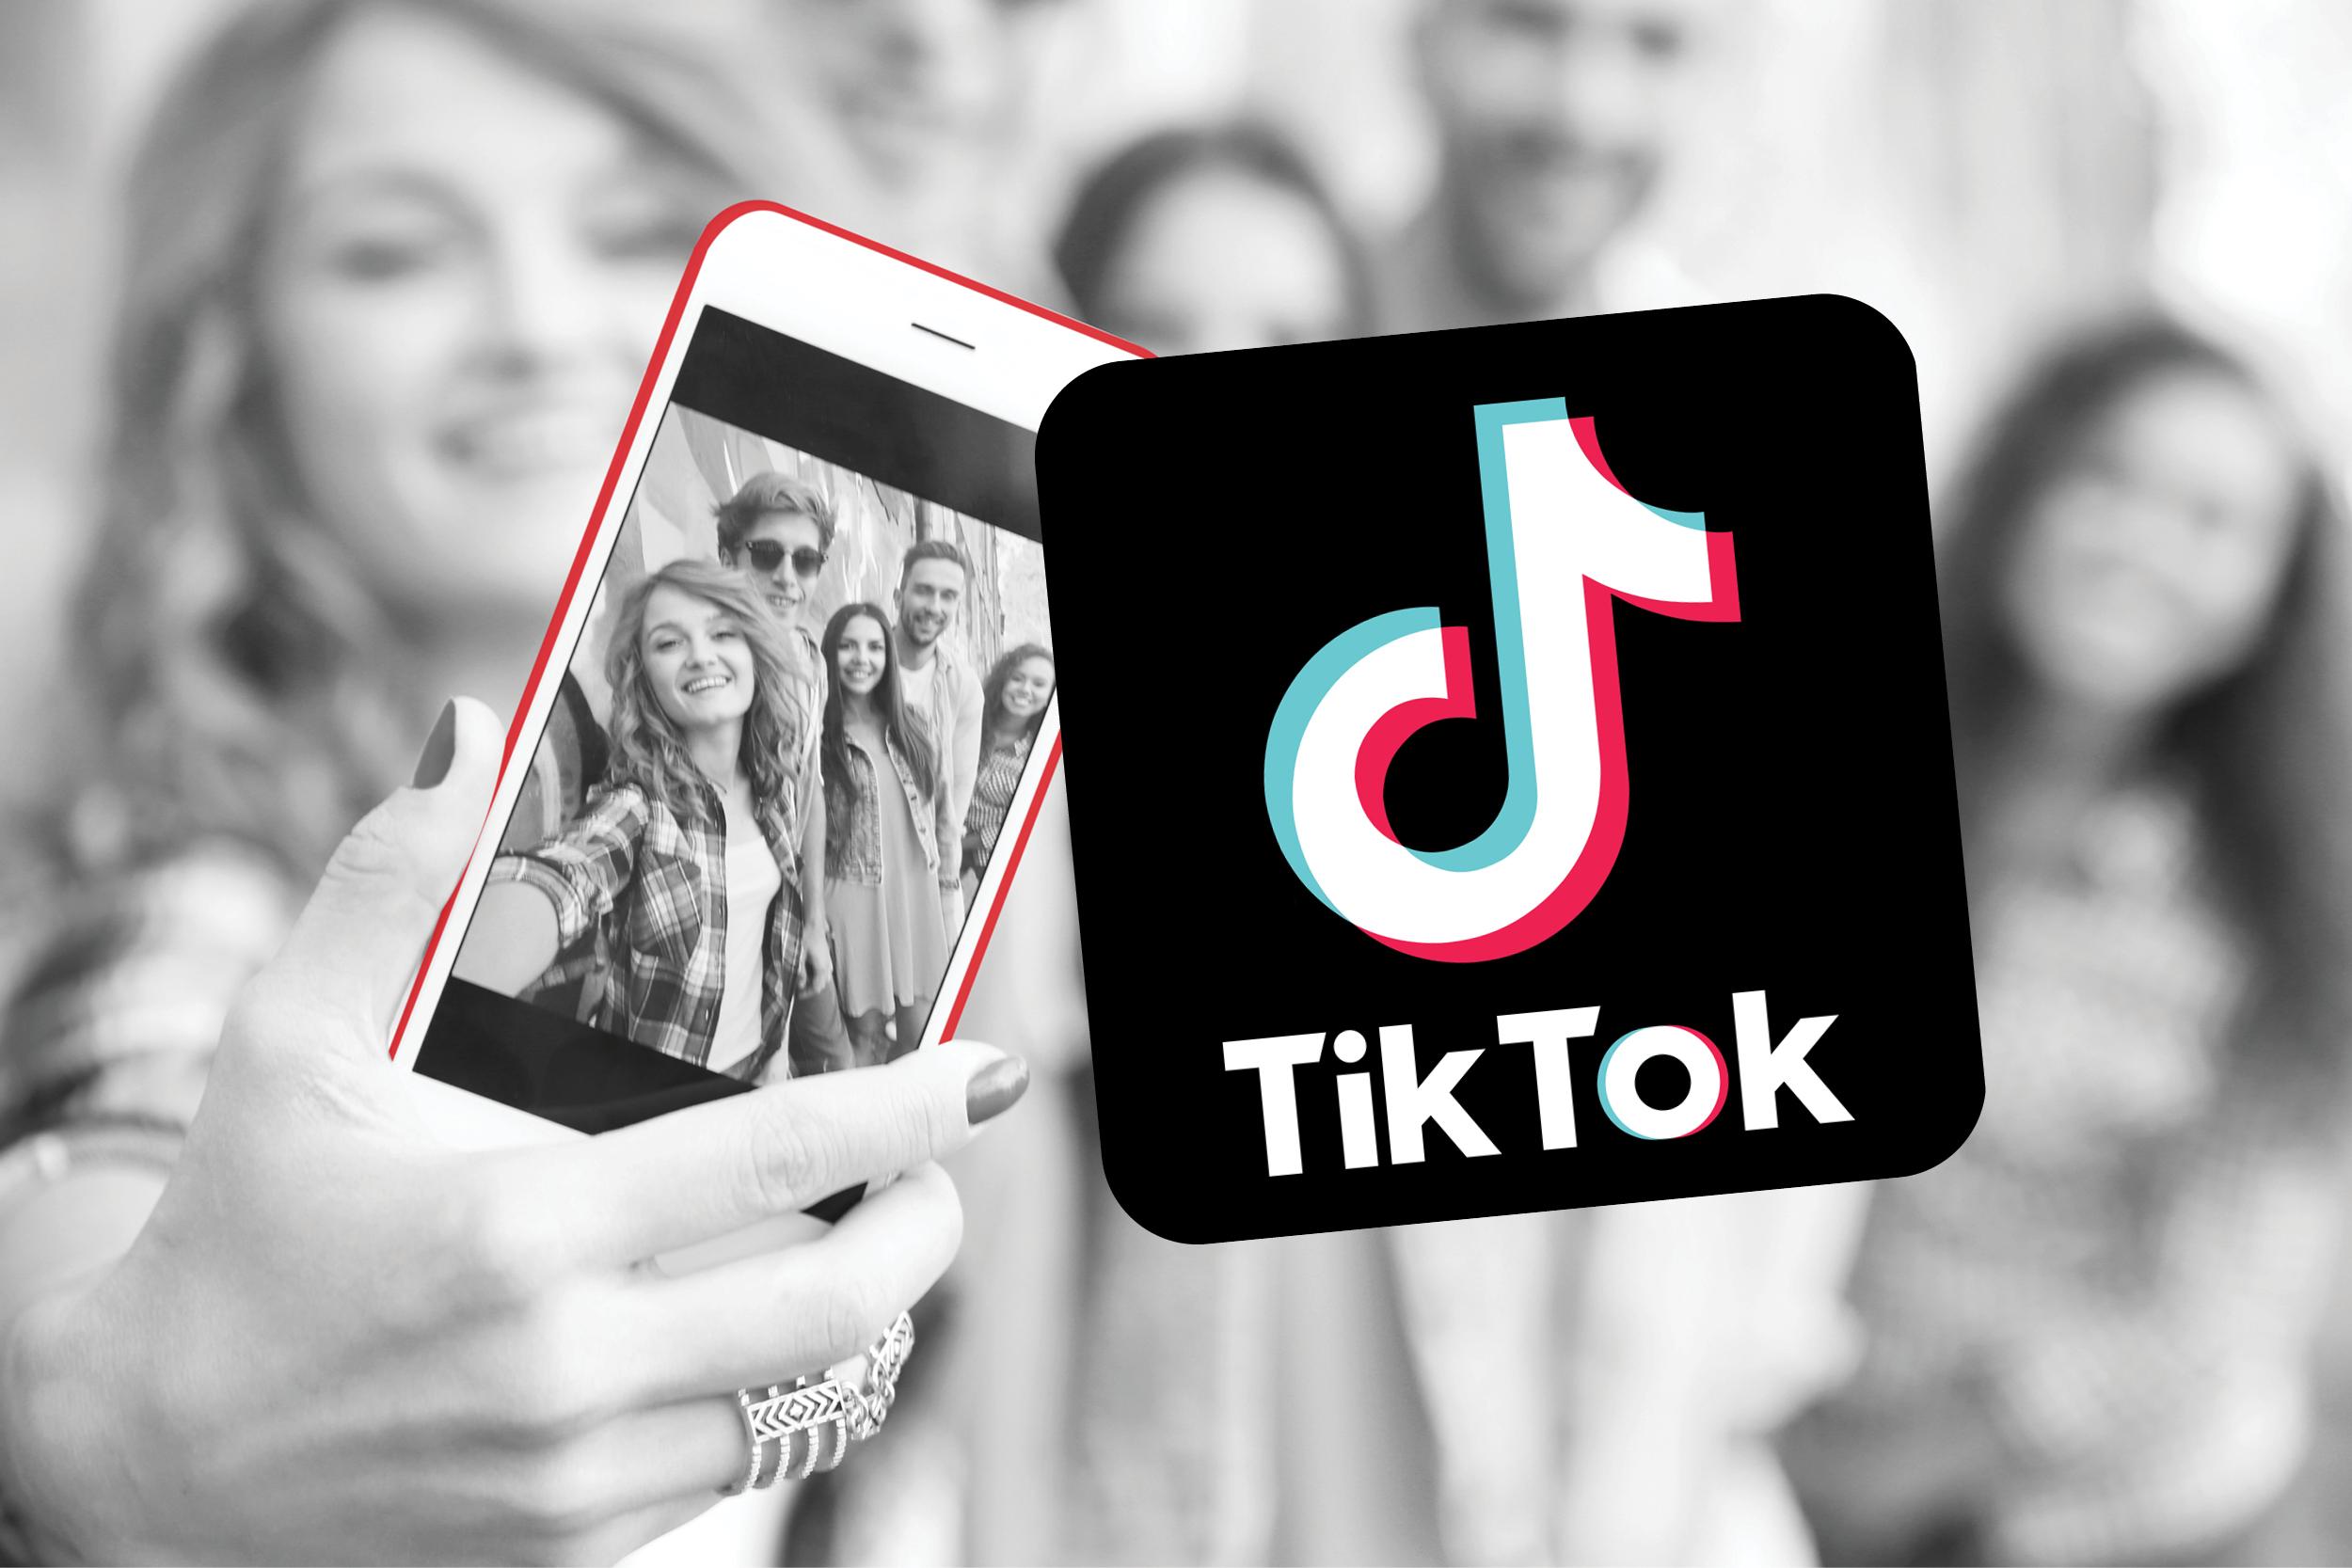 tiktok social media marketing on mobile